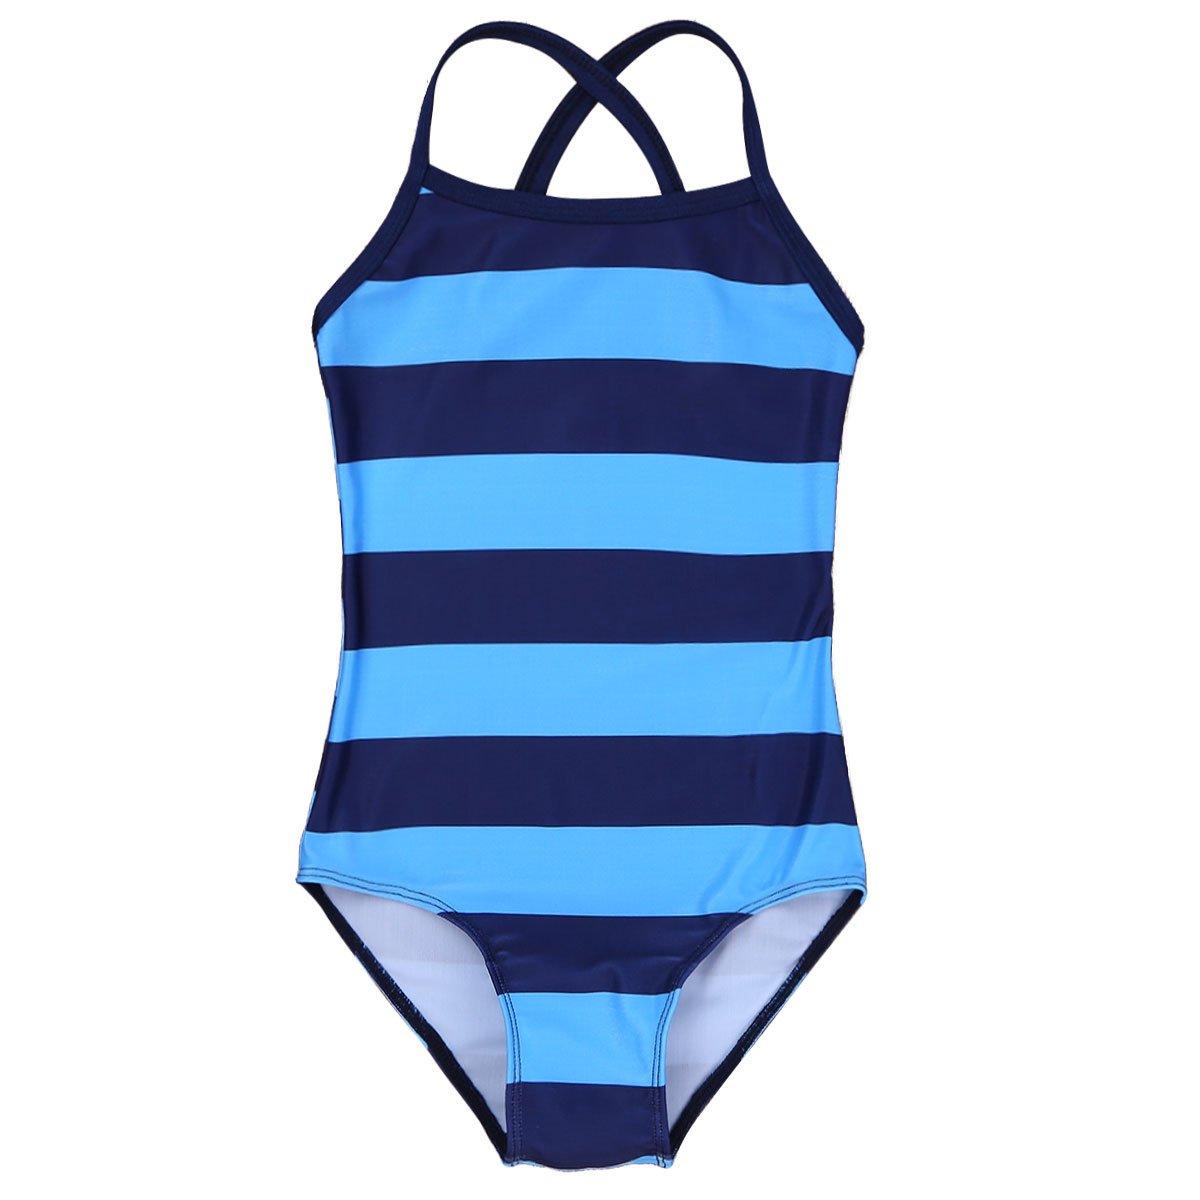 iixpin Kids Girls Striped Swimwear One Piece Criss Cross Back Swimsuit Spaghetti Shoulder Straps Bathing Suit